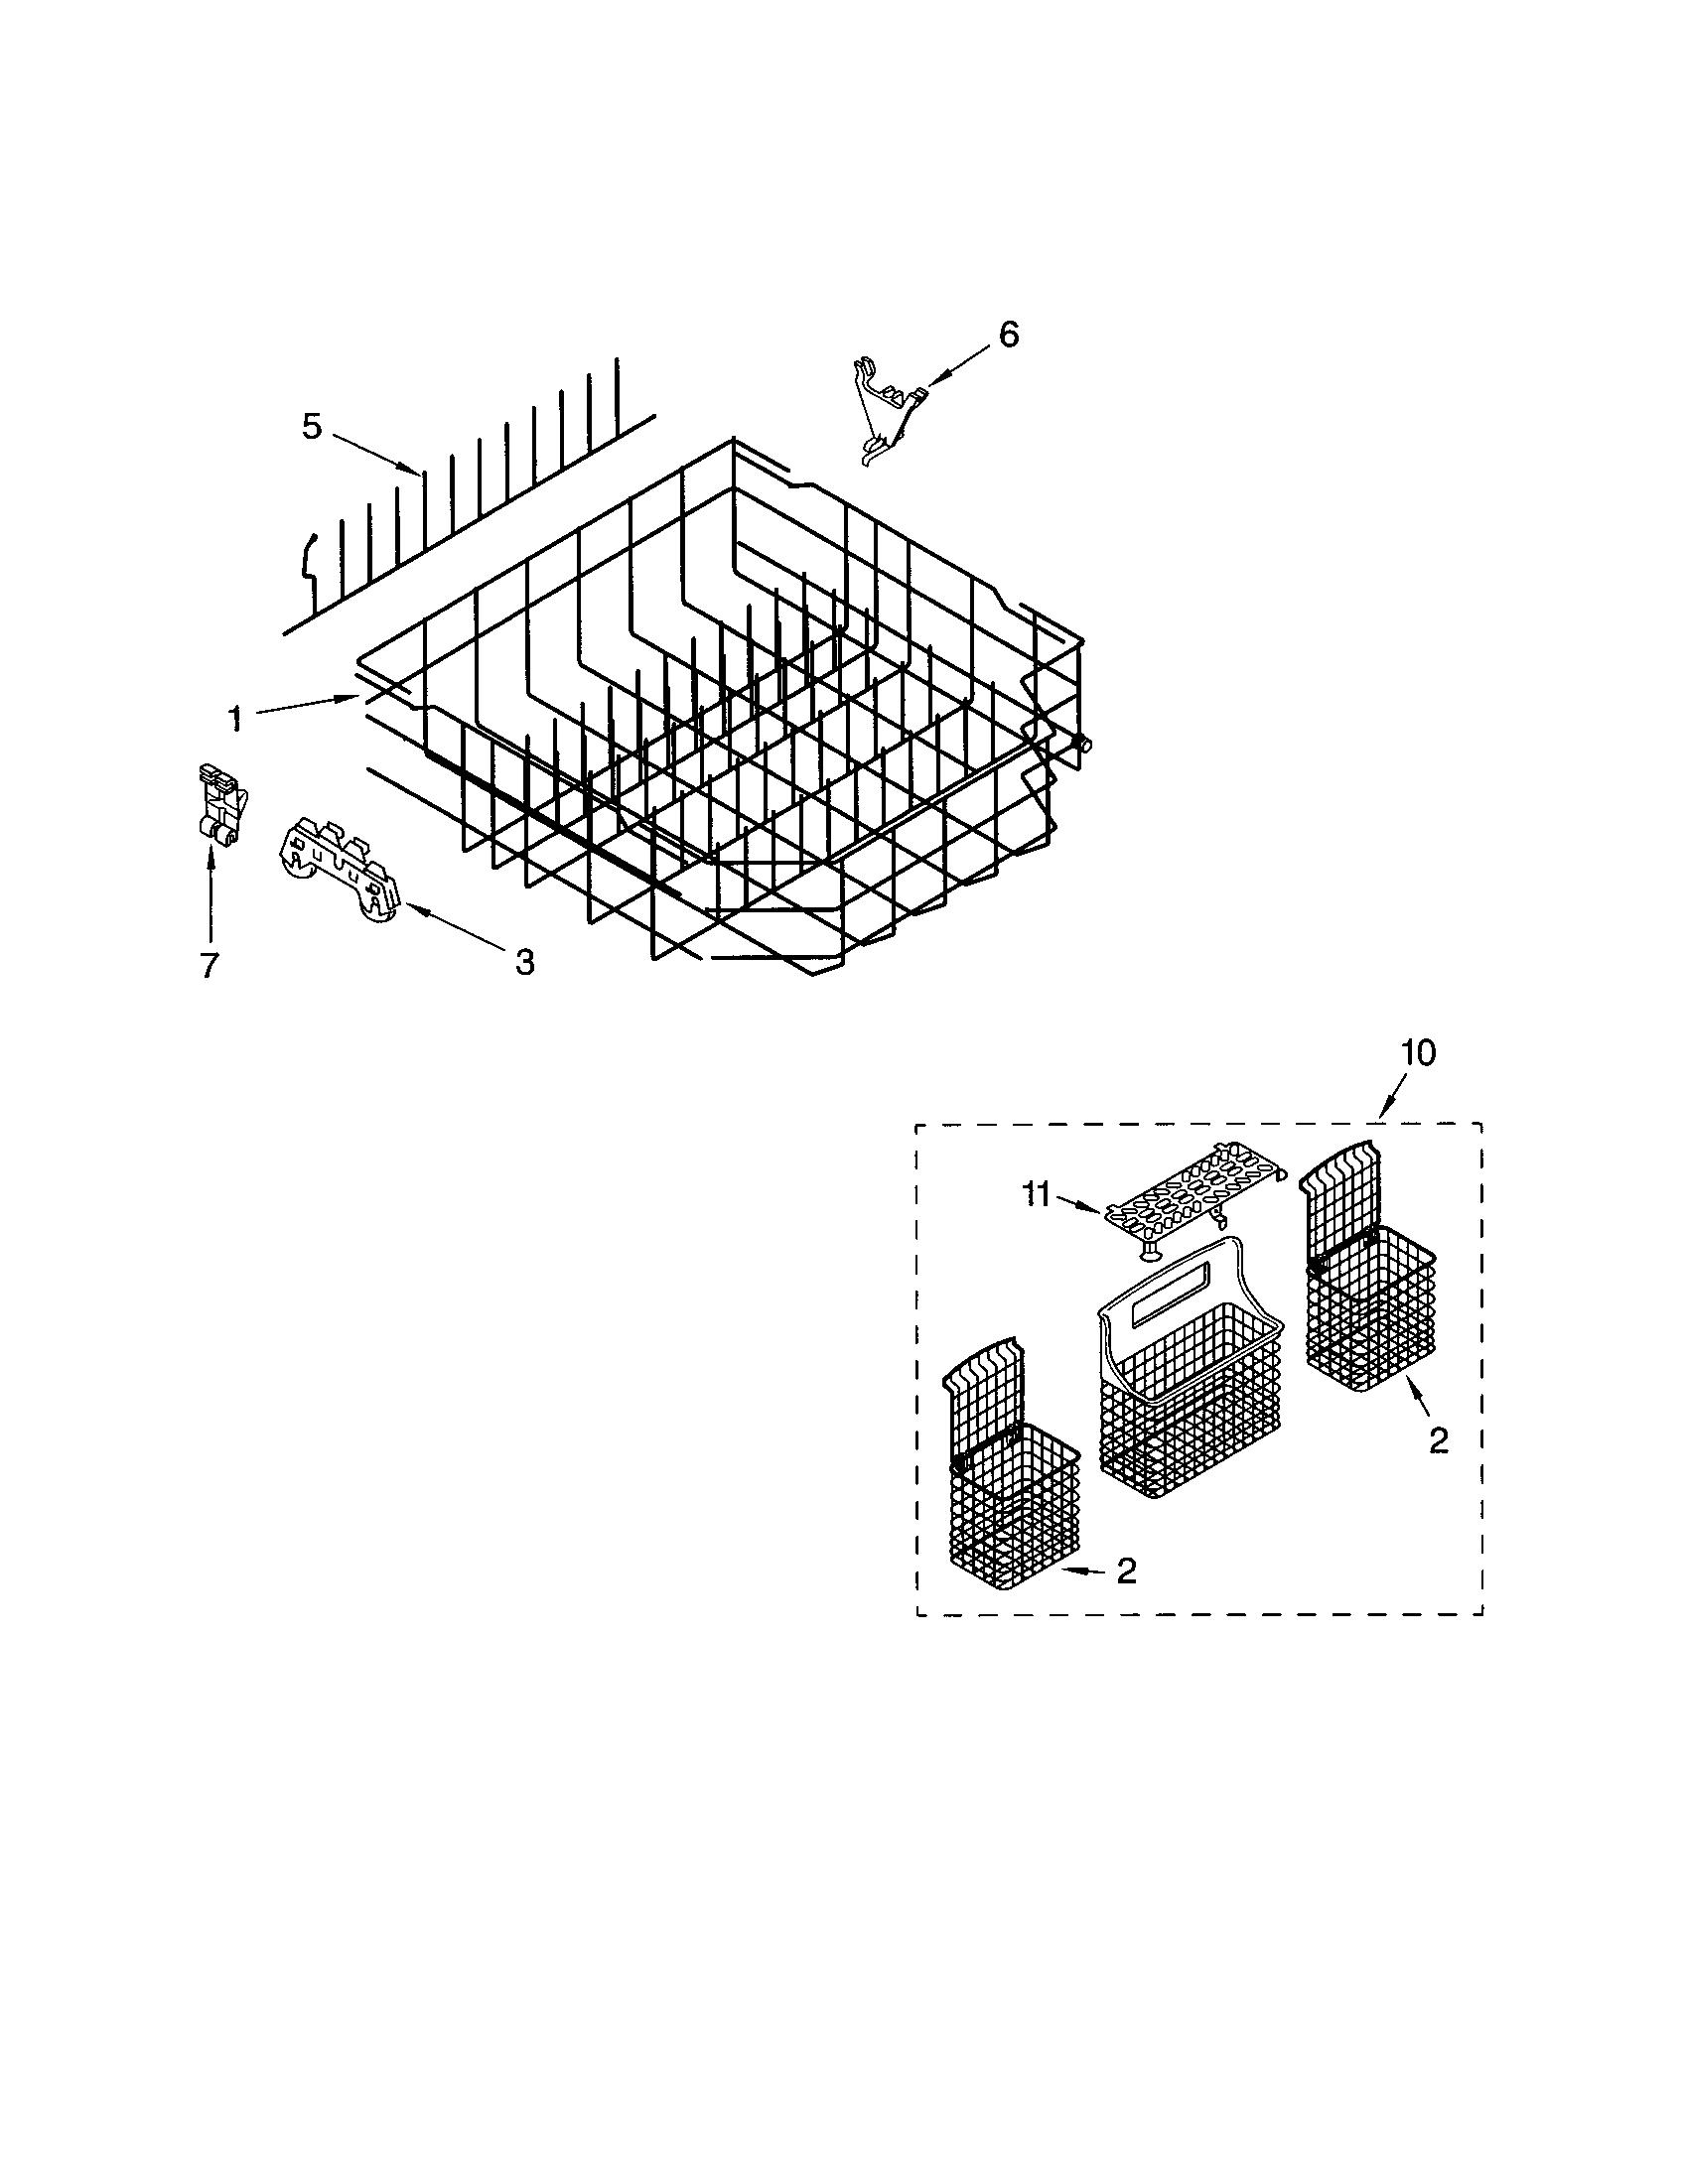 66513262k113 Kenmore Dishwasher Wiring Schematic,Kenmore